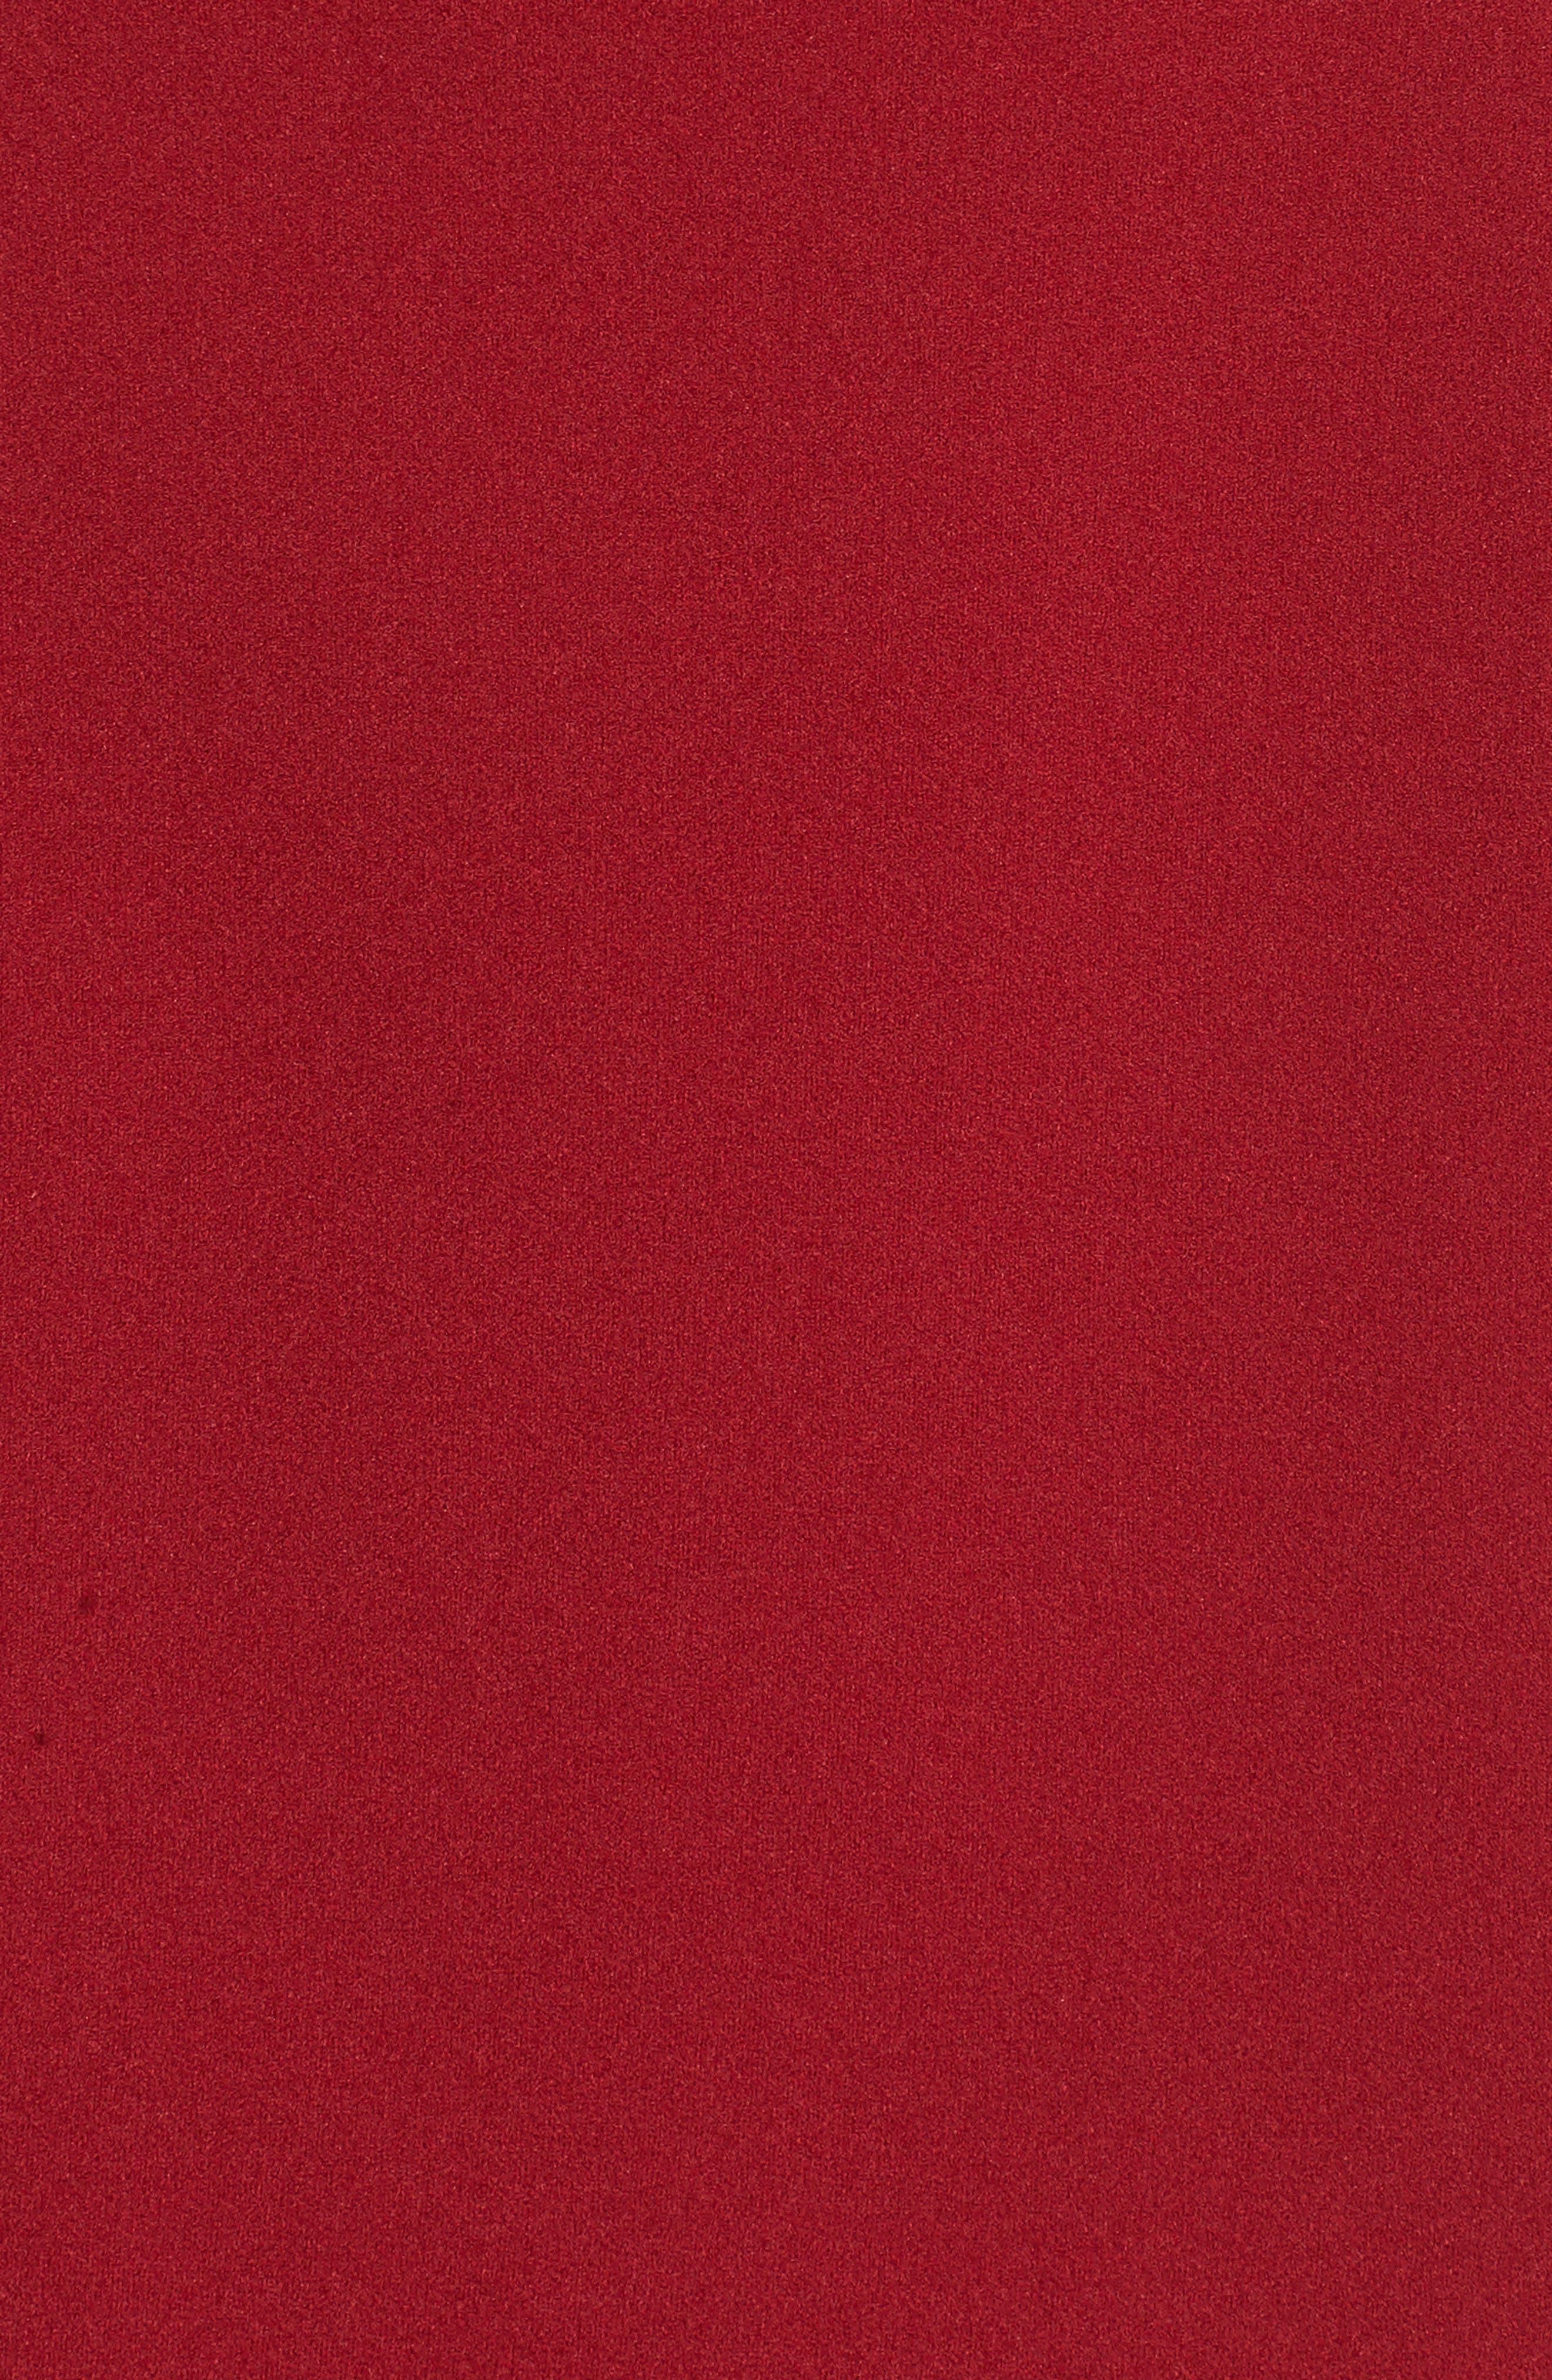 Strappy Illusion Yoke Sheath Dress,                             Alternate thumbnail 5, color,                             600